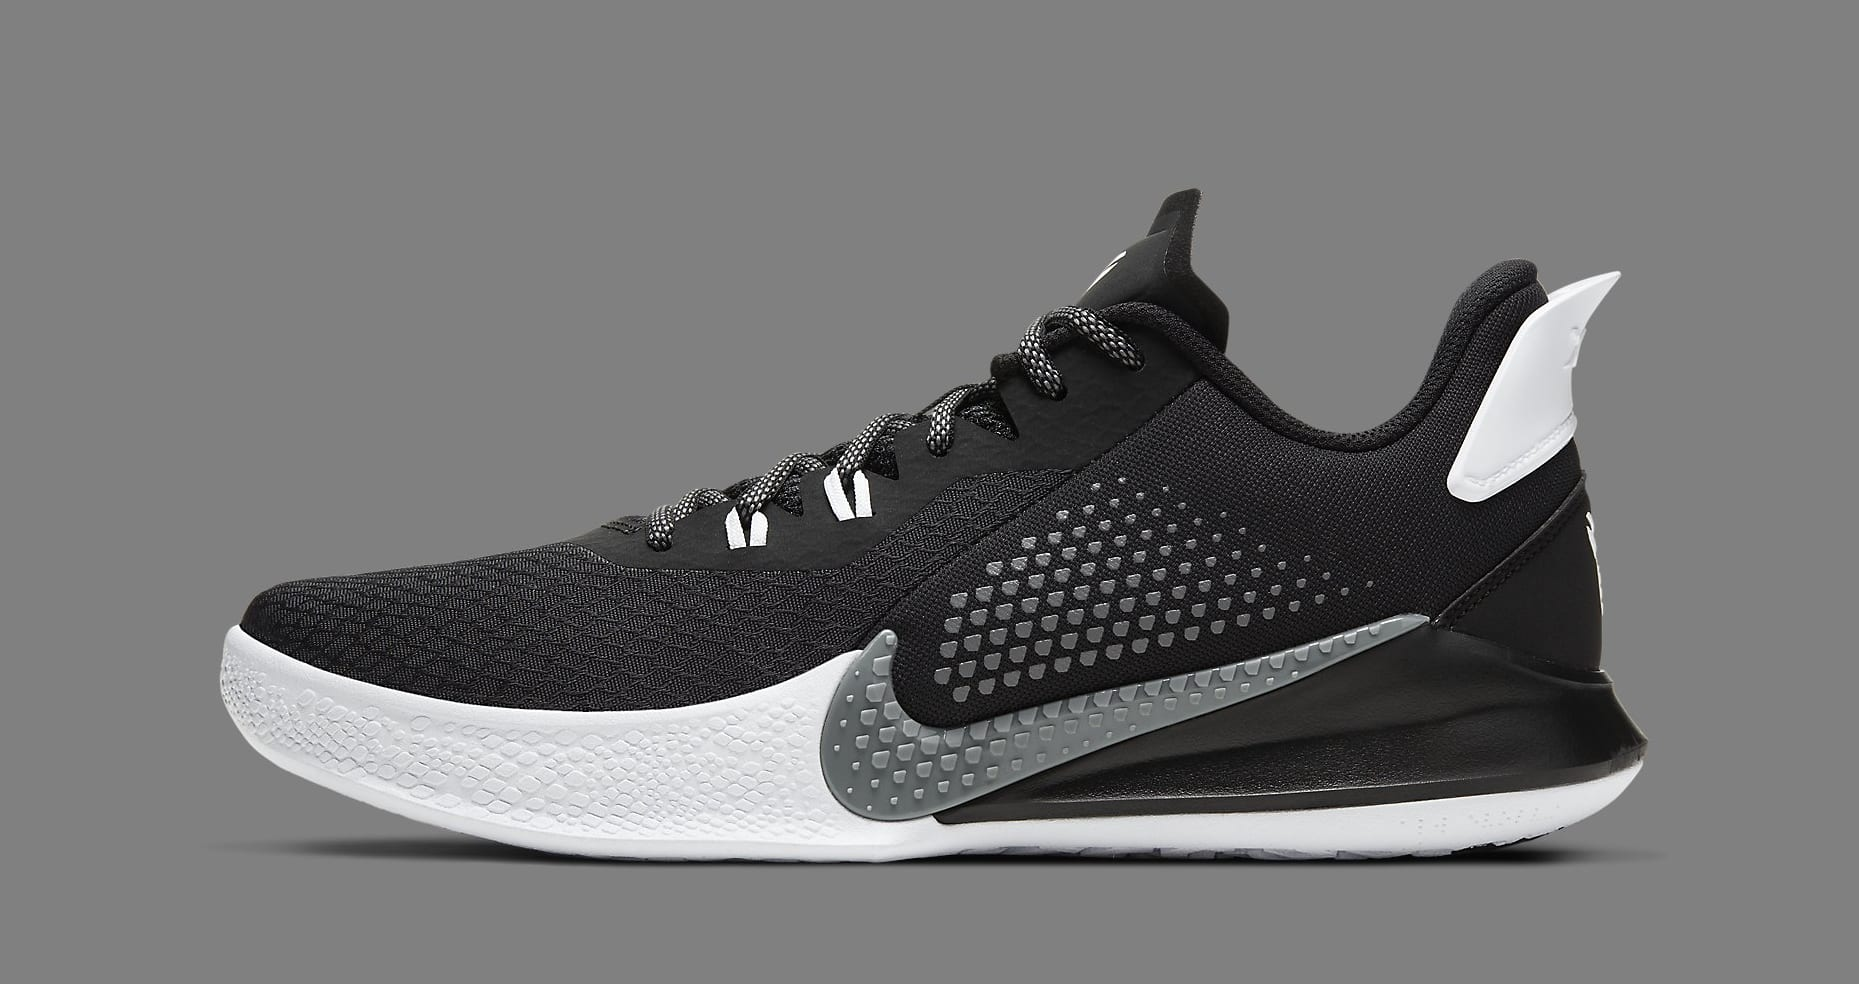 Nike Kobe Mamba Fury CK2087-001 Lateral